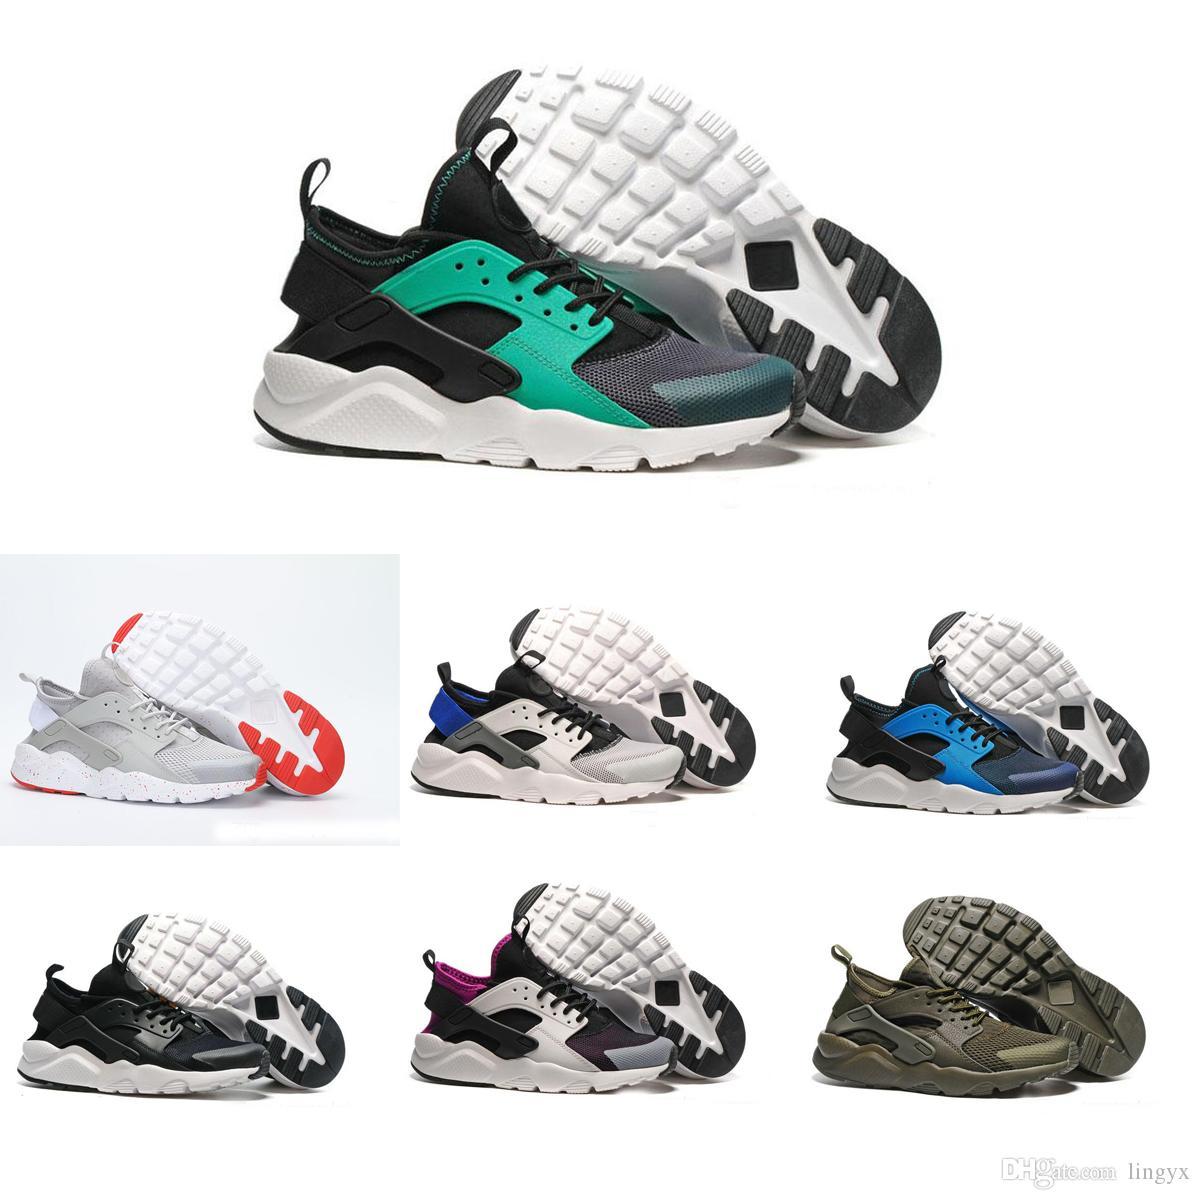 more photos 7b14f 0442e Großhandel Nike Air Huarache Run Neue Huarache 4 Ultra Laufschuhe Huraches  Für Herren Damen Schwarz Weiß Rot Bunte Huaraches Designer Schuhe  Turnschuhe Von ...